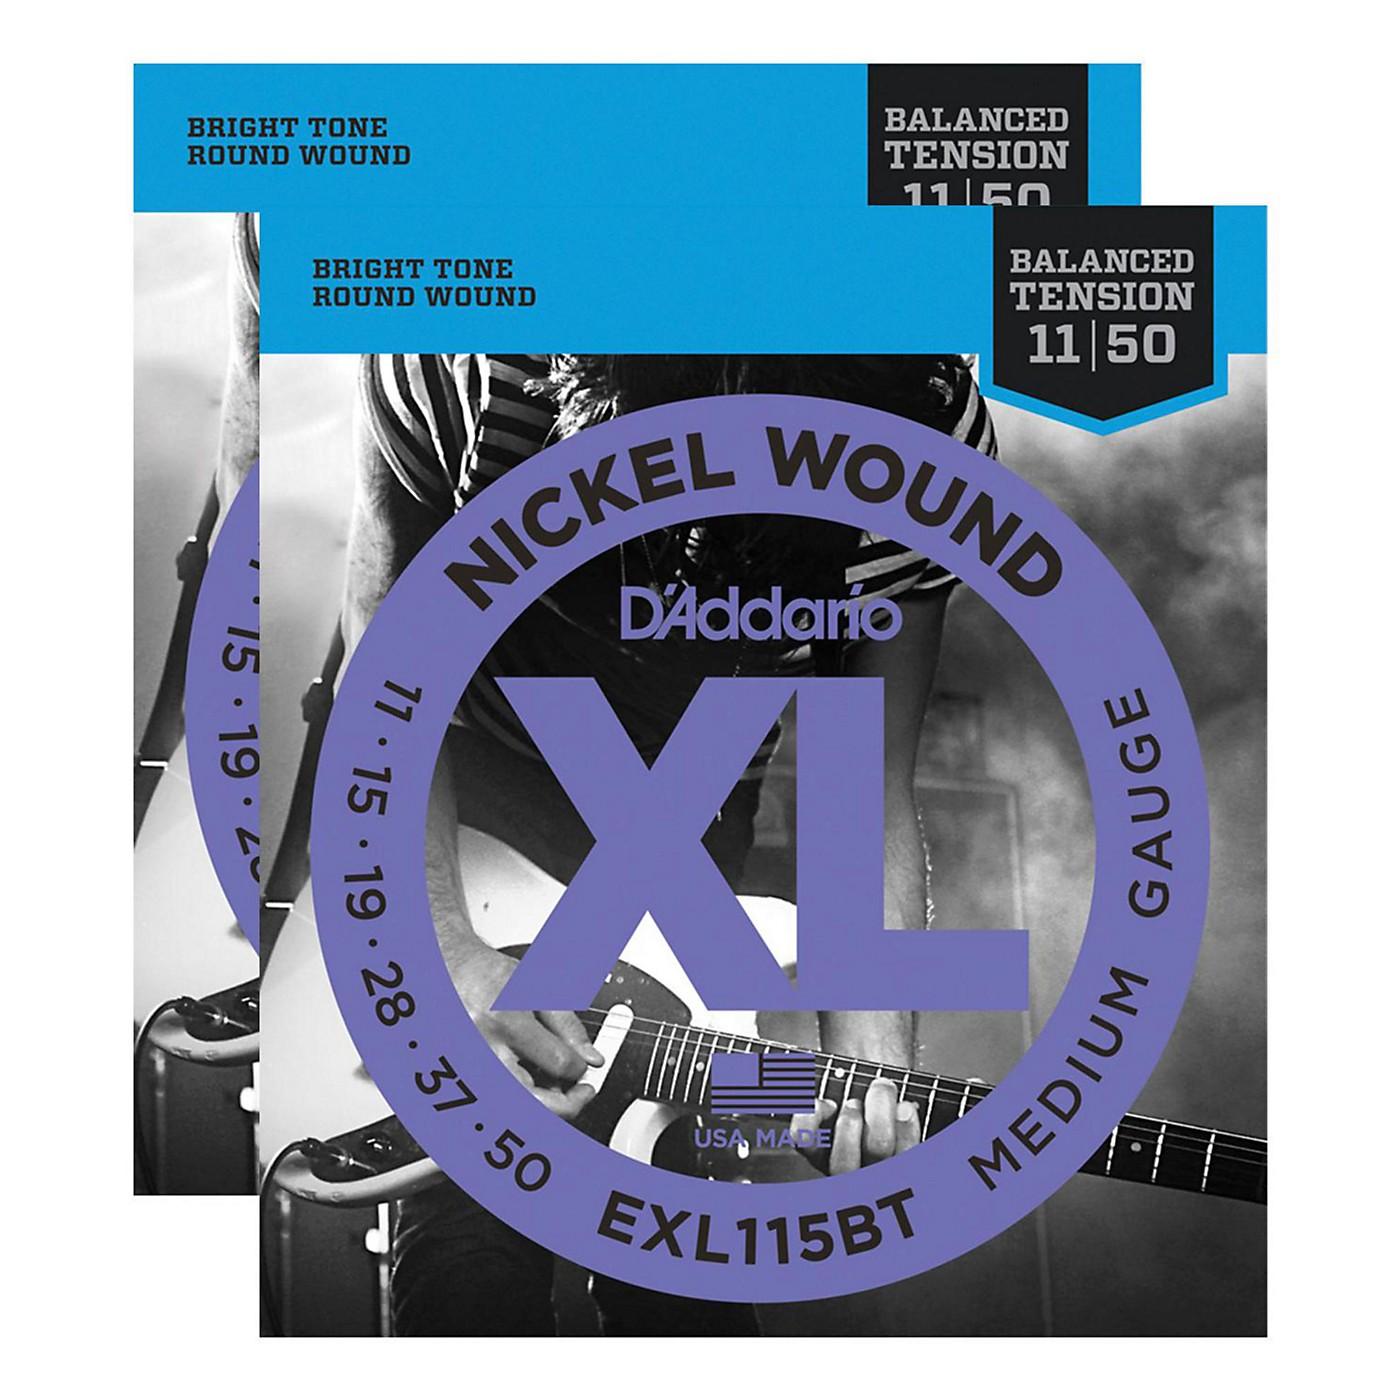 D'Addario EXL115BT Balanced Tension Medium Electric Guitar Strings (2-Pack) thumbnail